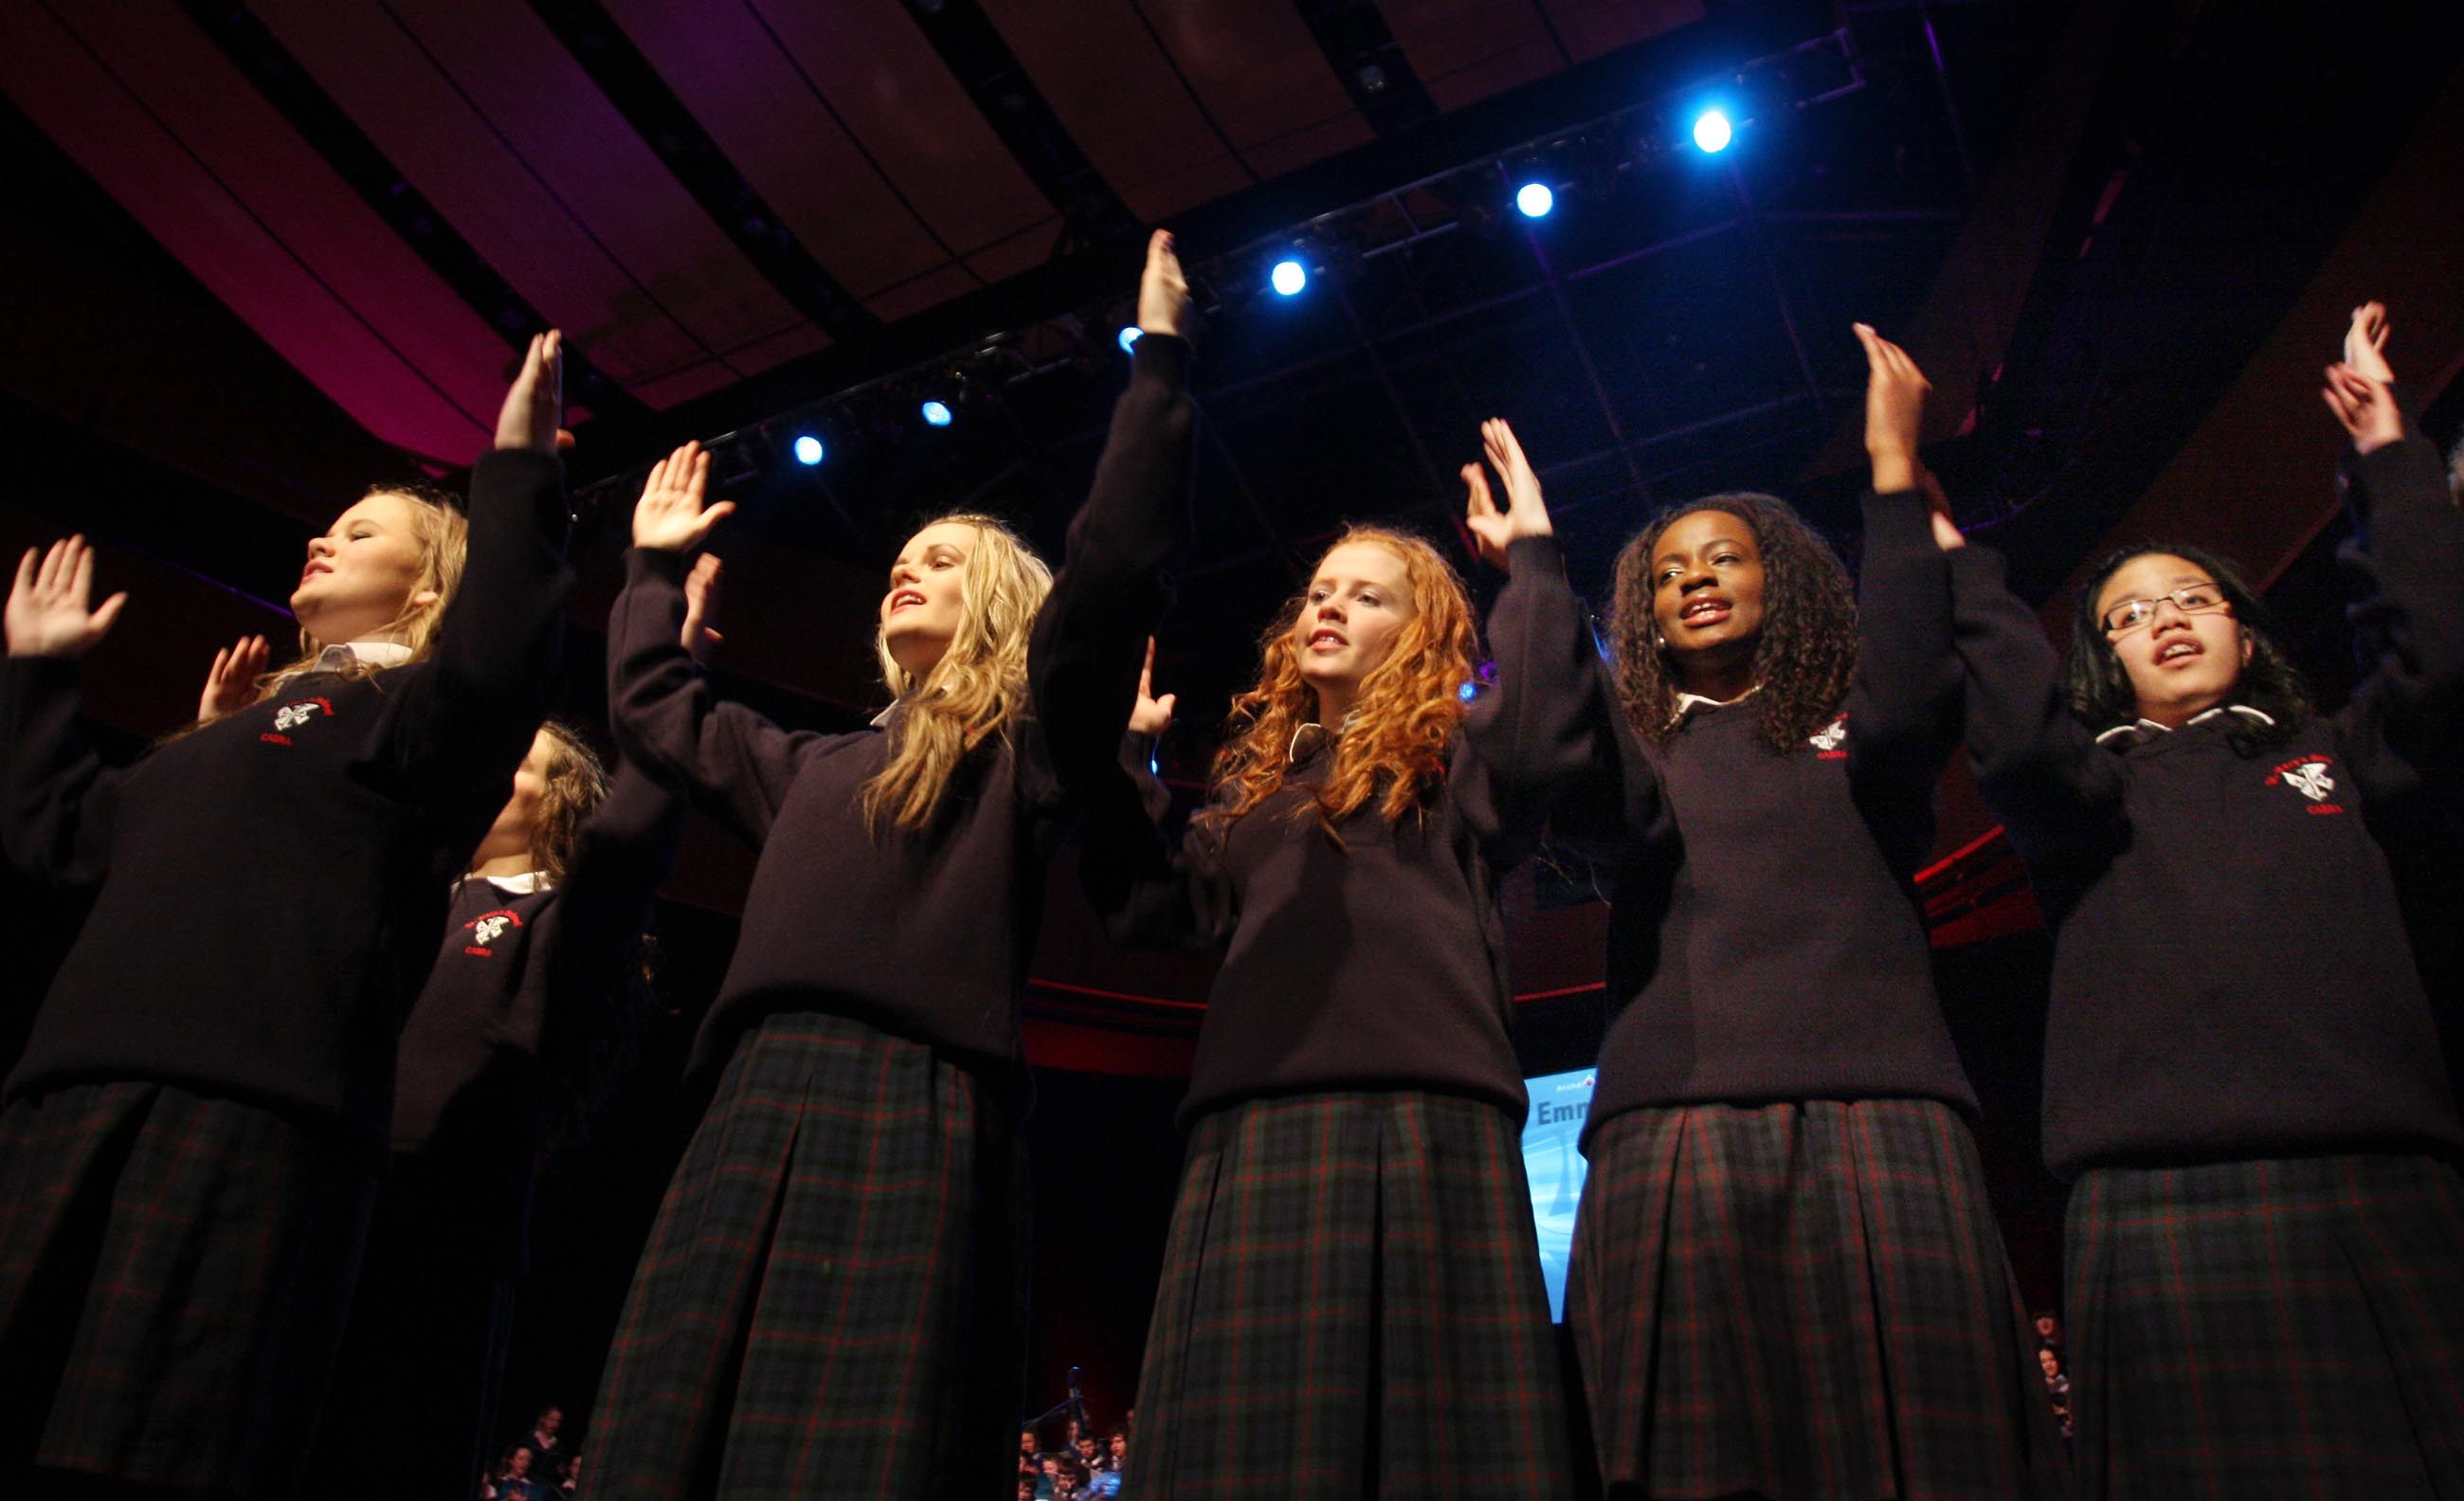 16-Deaf-choir-at-emmanuel